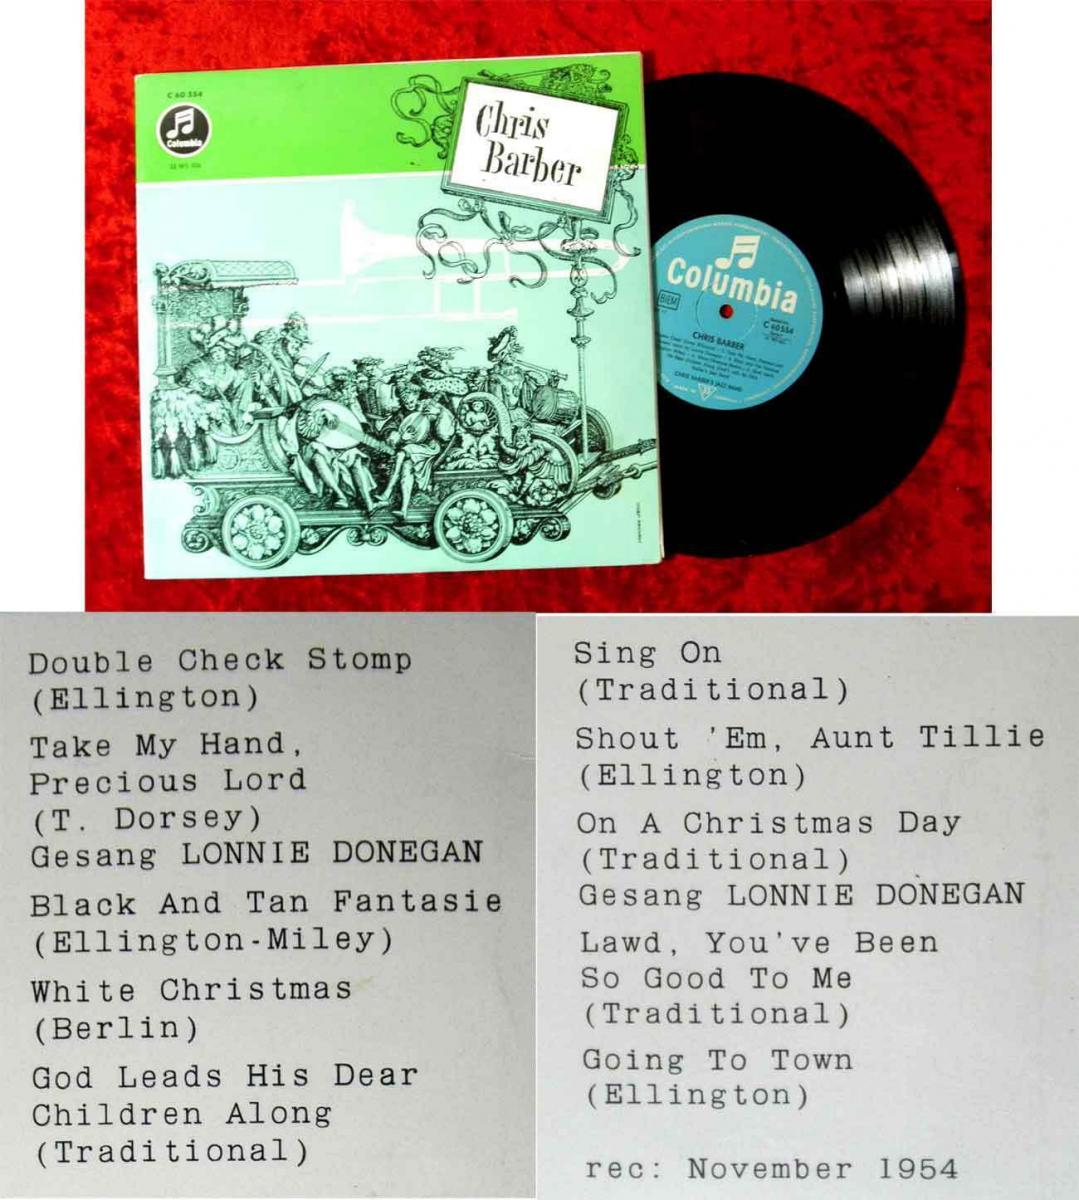 25cm LP Chris Barber (Columbia C 60 554) D 1960 0